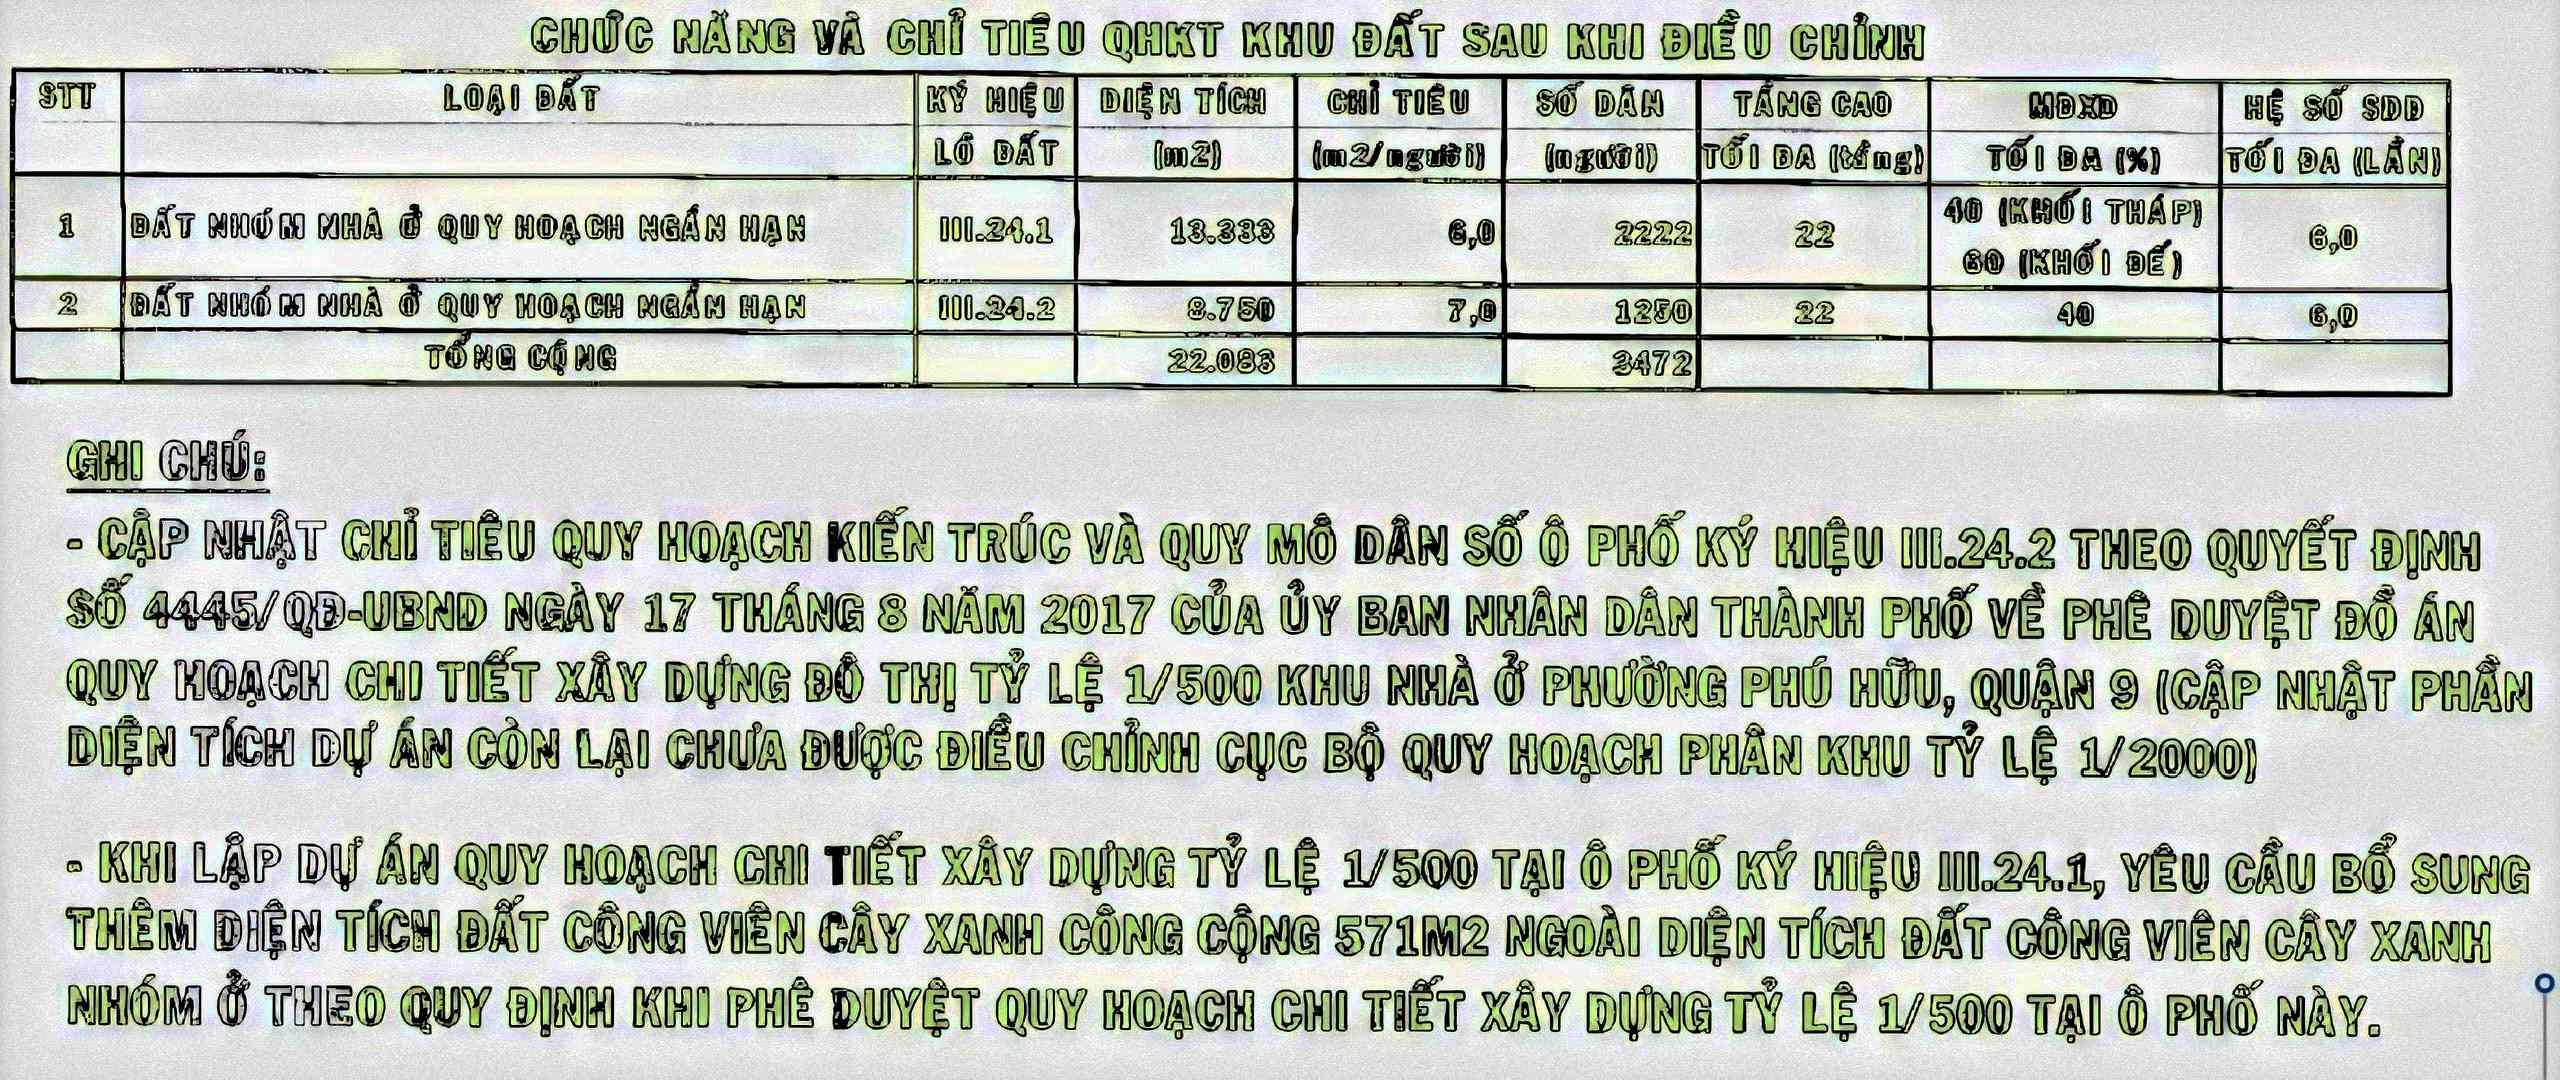 hausbelo ezland group quy hoach 1-500 moi nhat